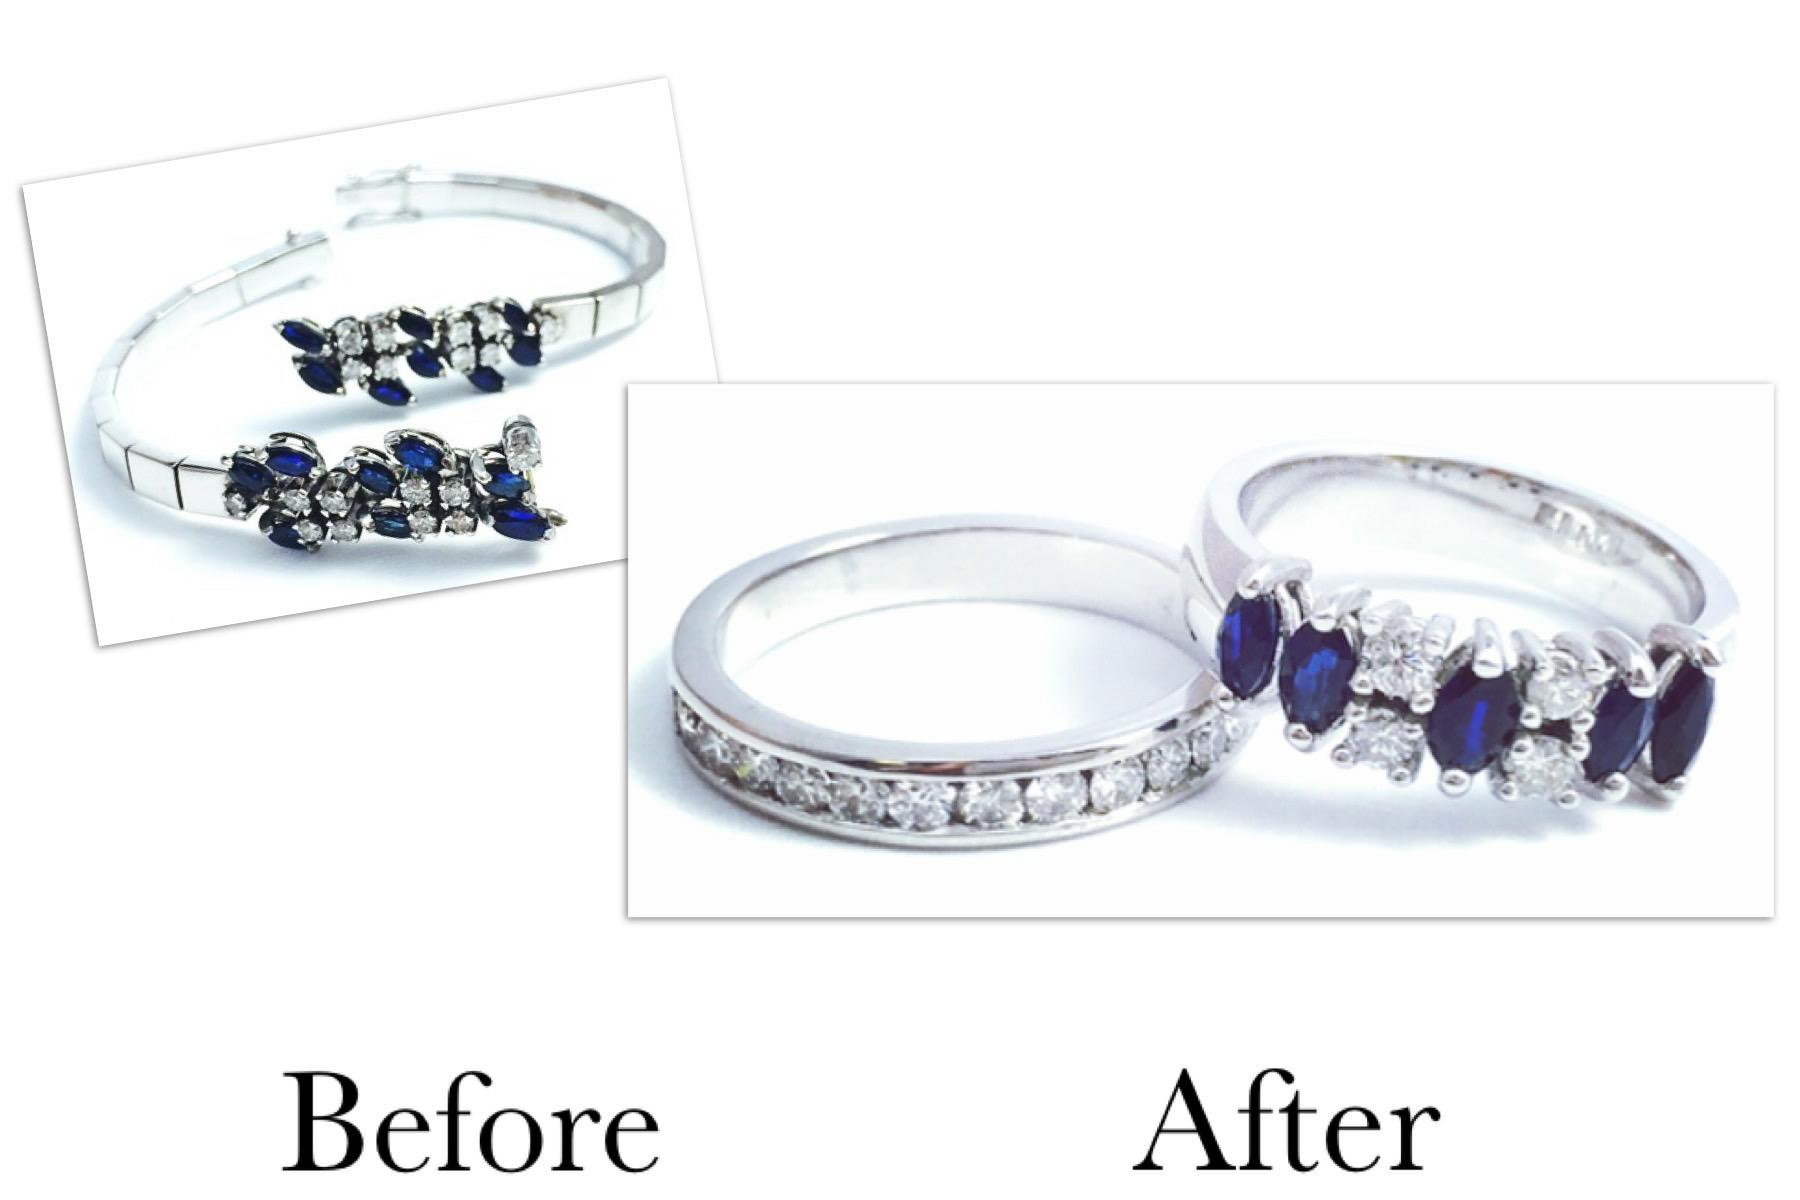 Sapphire & Diamond Bracelet Redesign